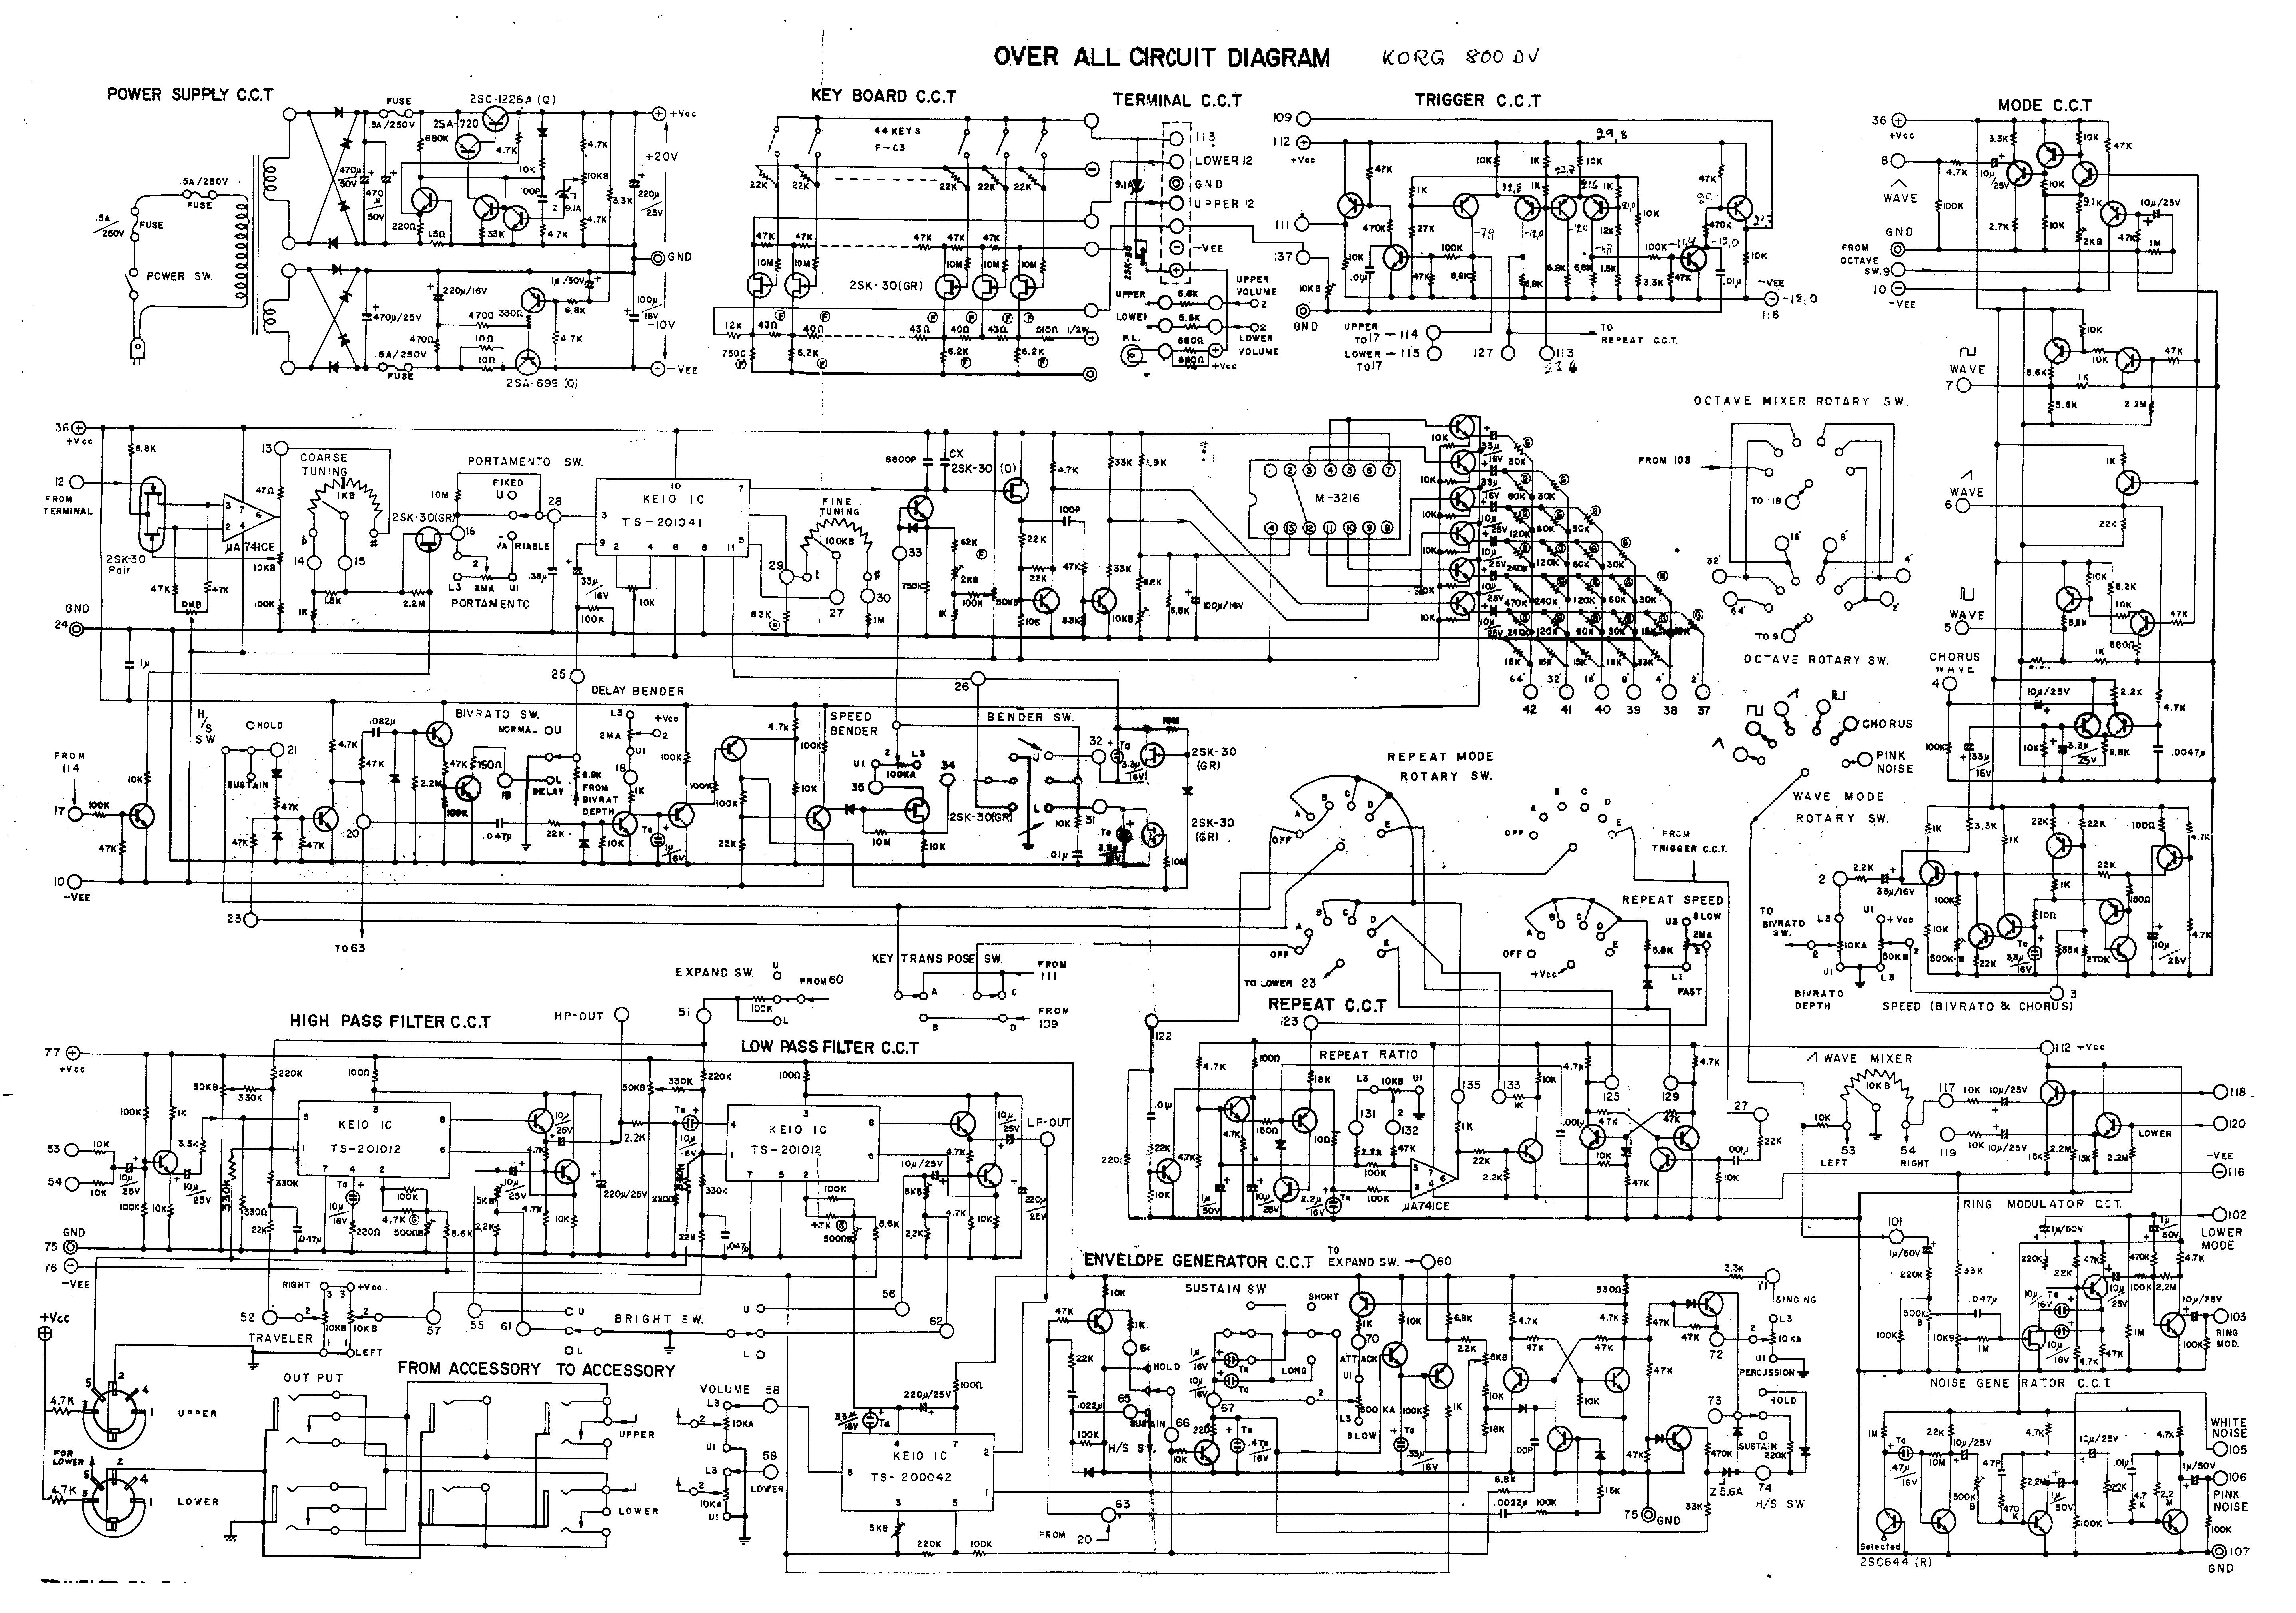 Korg Wiring Diagram Layout Diagrams Toyota Engine P062dno1 M3 Sm Service Manual Download Schematics Eeprom Repair Info Rh Elektrotanya Com Hvac 3 Way Switch